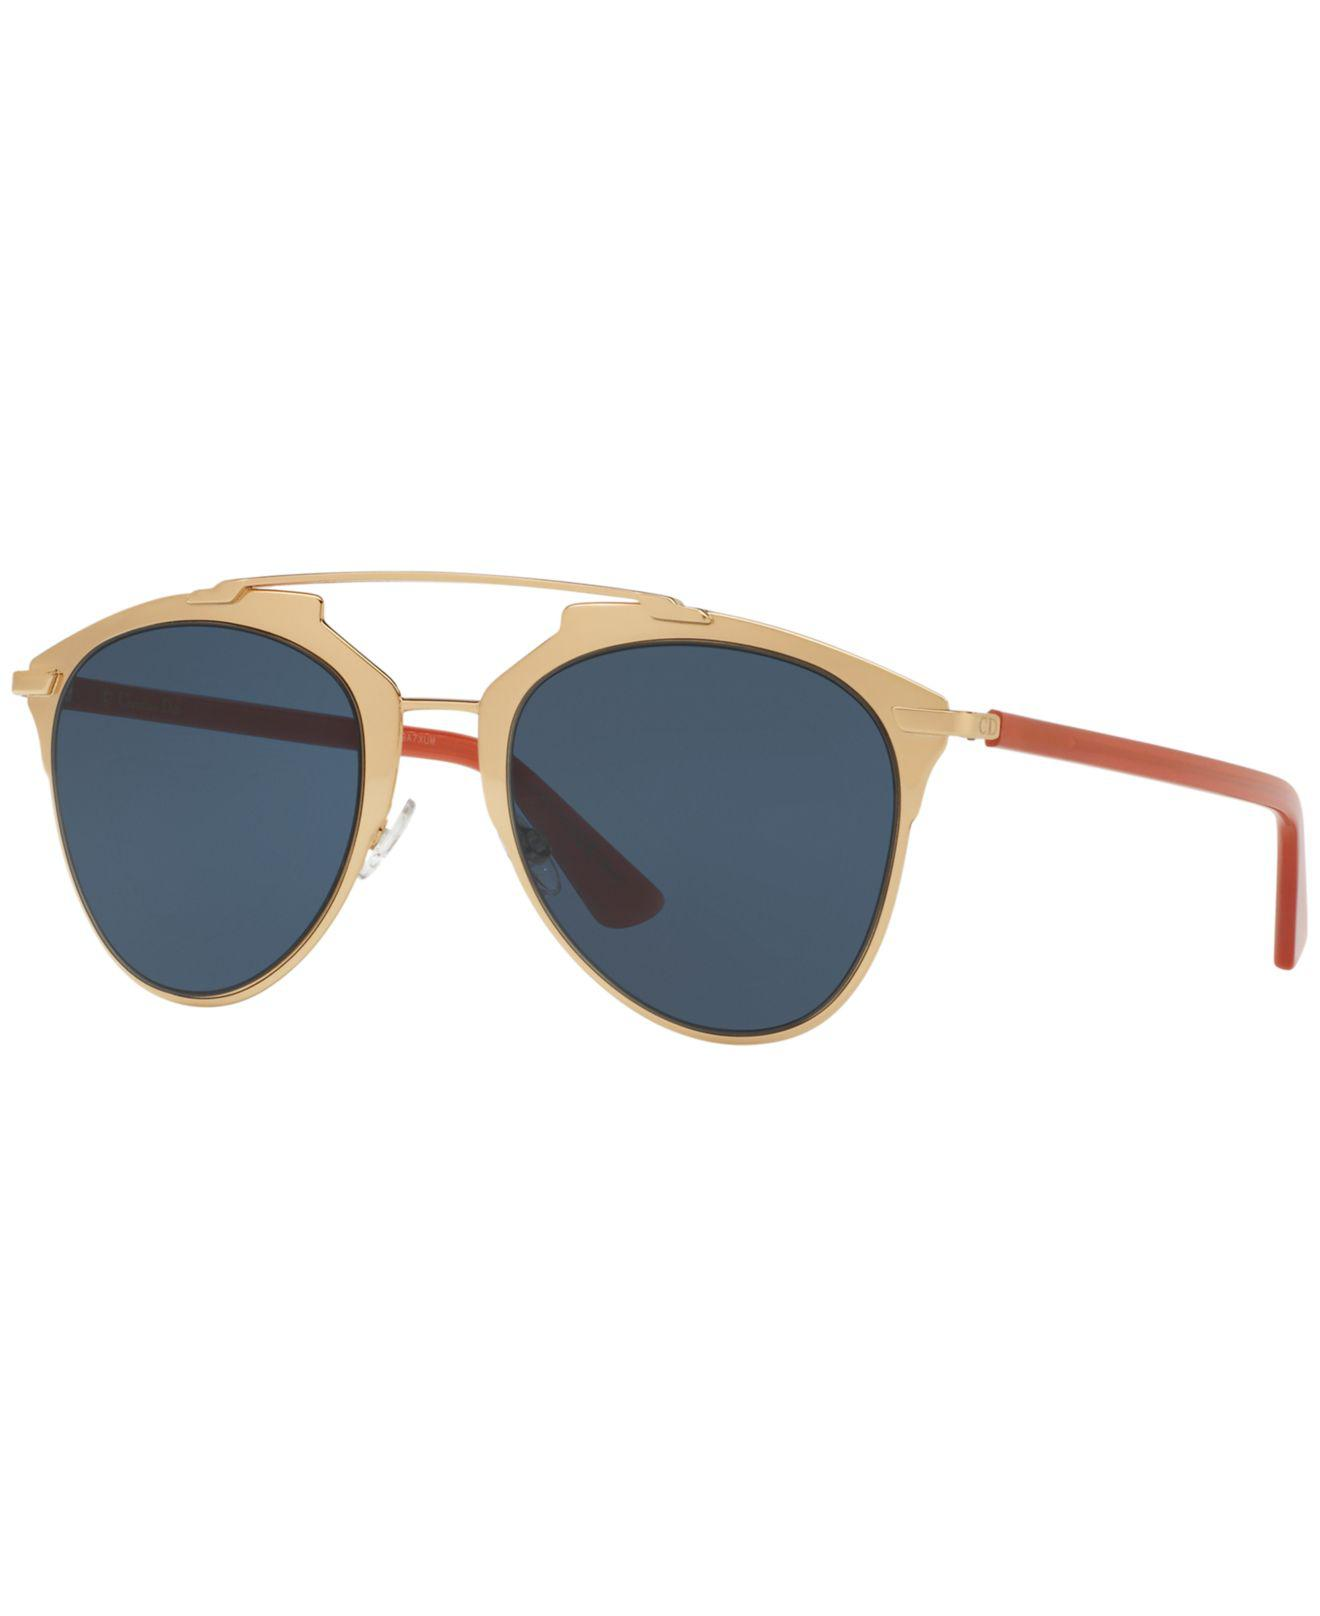 15b2356191 Lyst - Dior Women s Reflected Mirrored Brow Bar Aviator Sunglasses ...